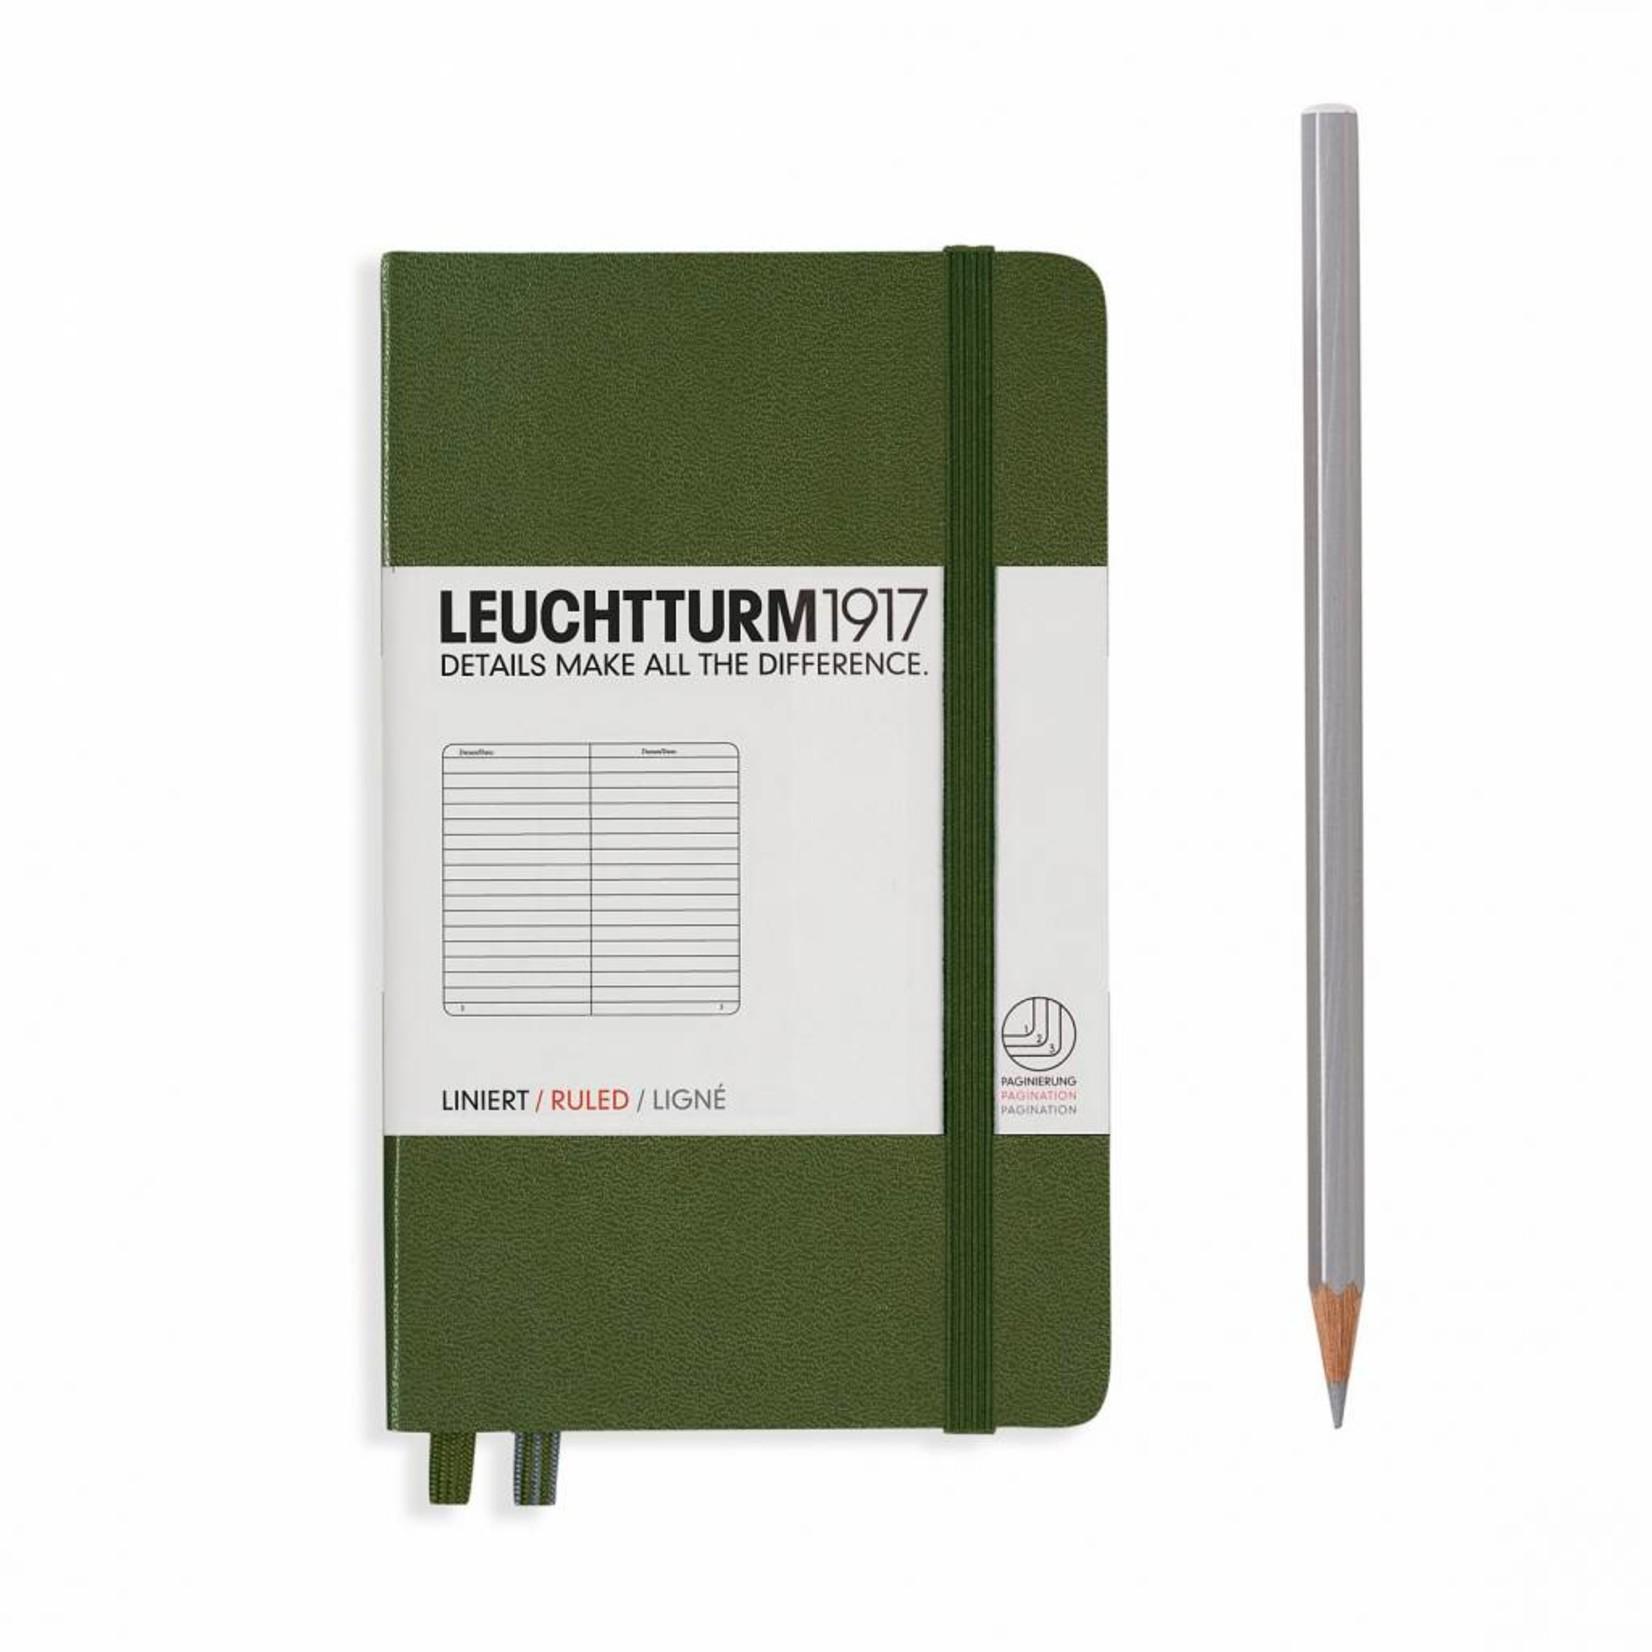 LT Notizbuch A6 POCKET HC army, liniert